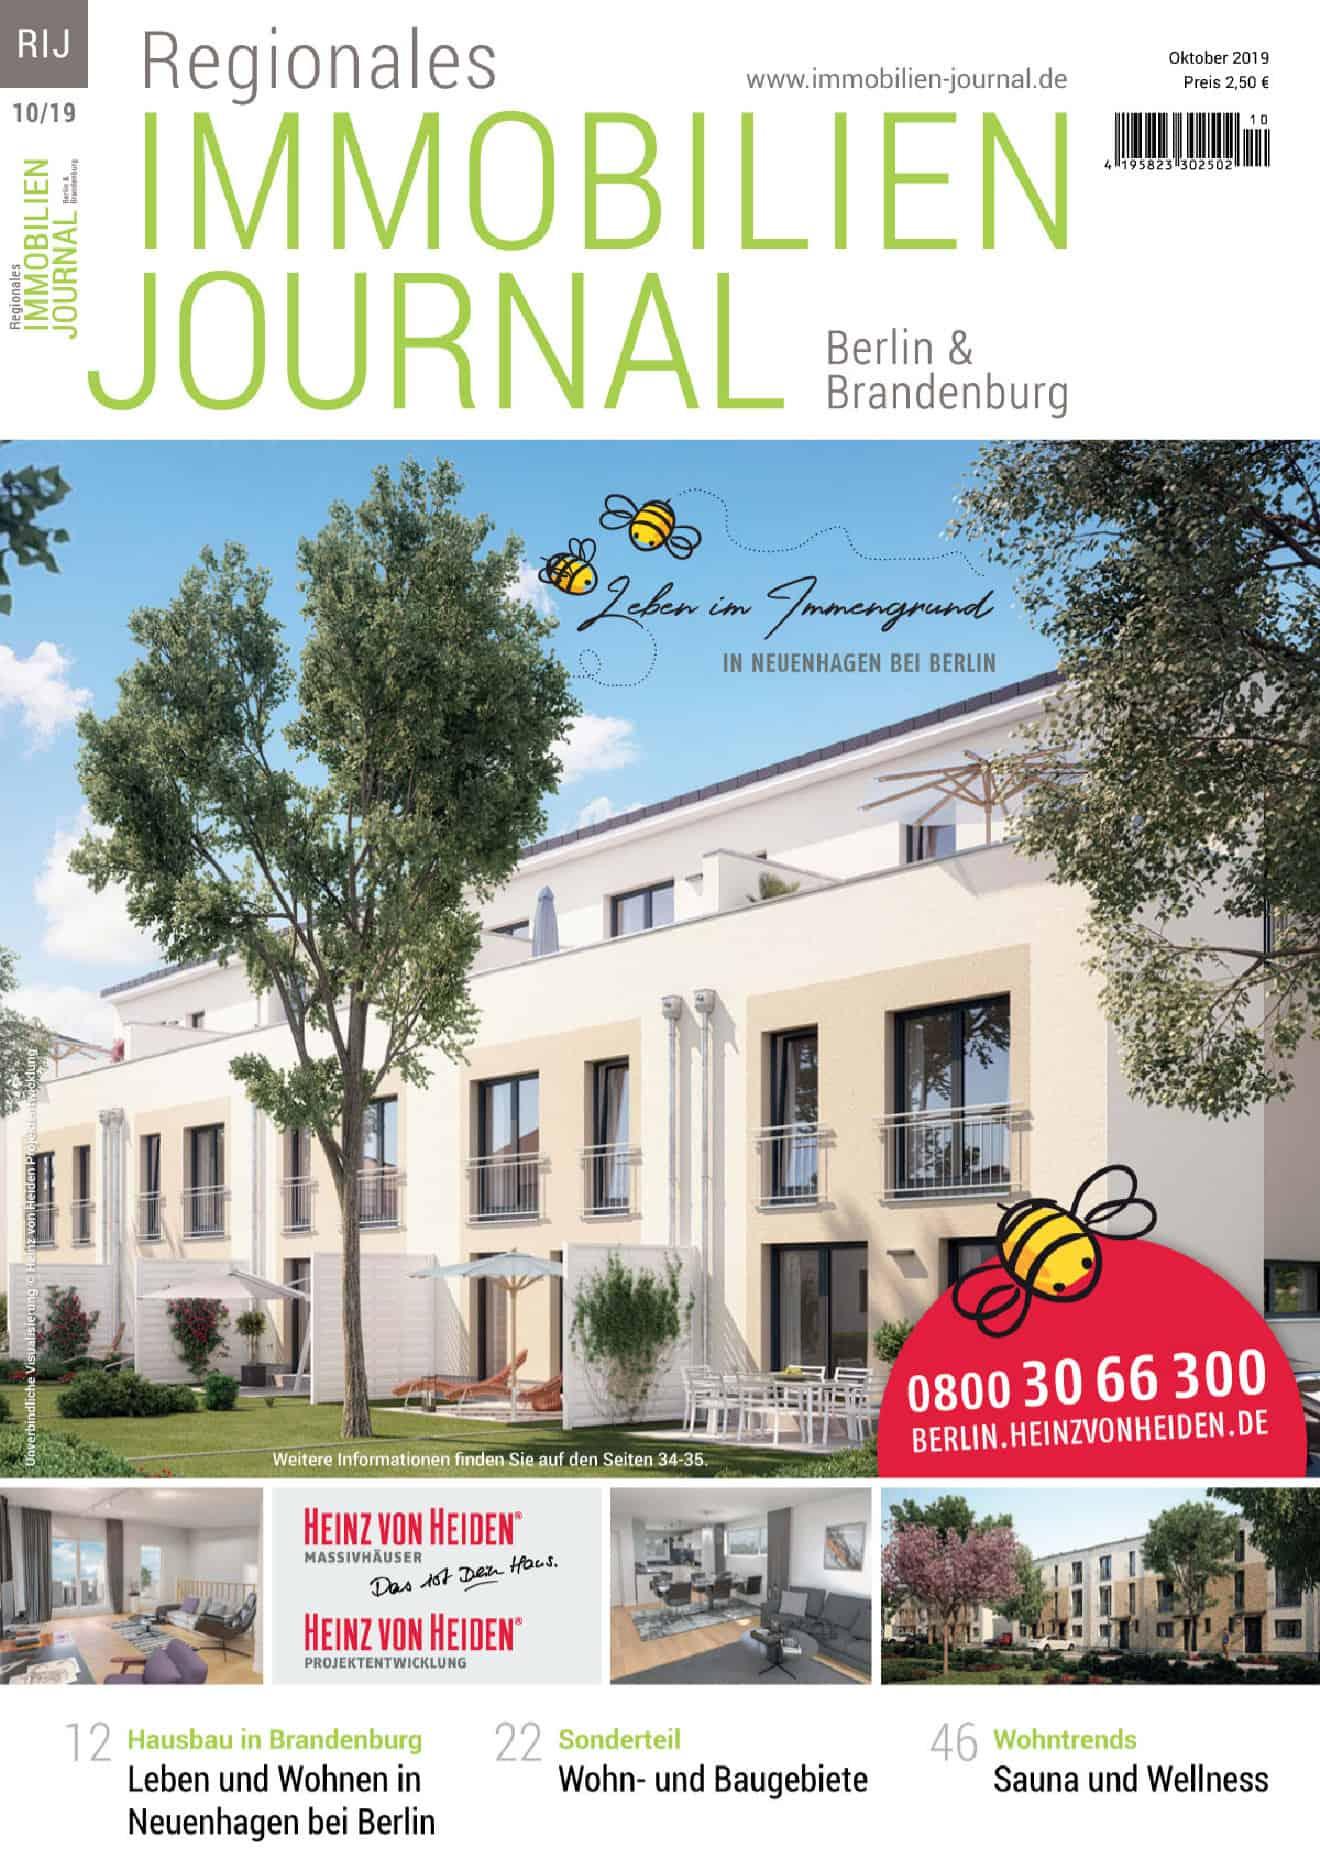 Regionales Immobilien Journal Berlin & Brandenburg 10-2019